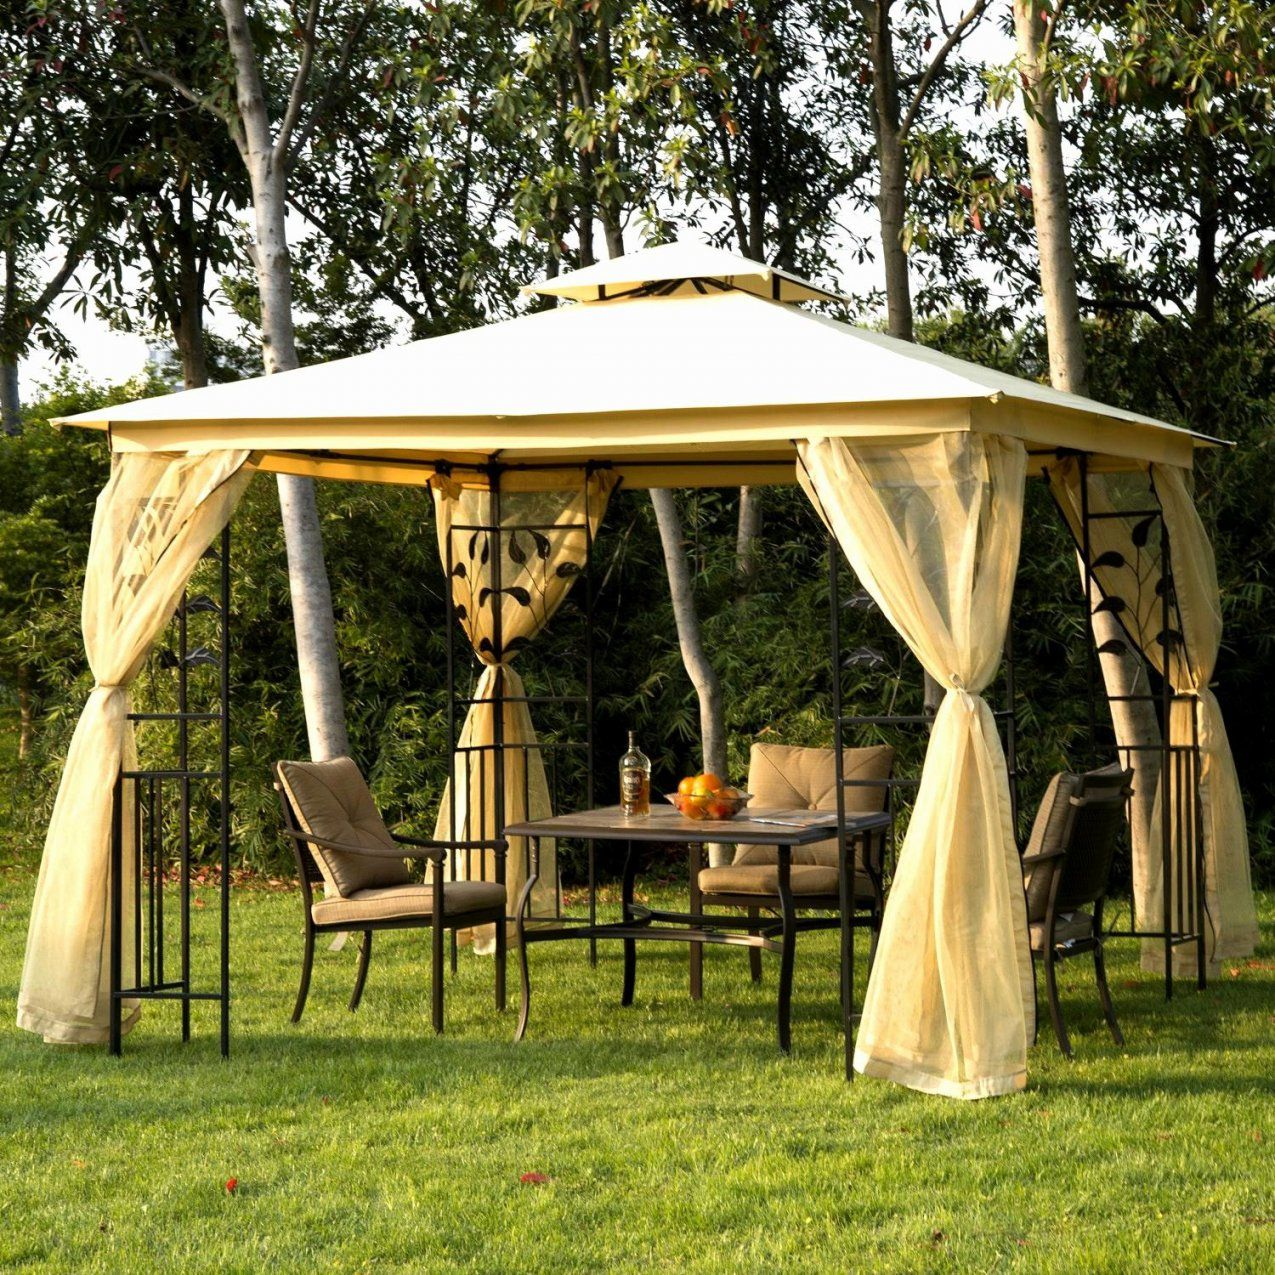 pavillon 3x3 wasserdicht g nstig haus design ideen. Black Bedroom Furniture Sets. Home Design Ideas